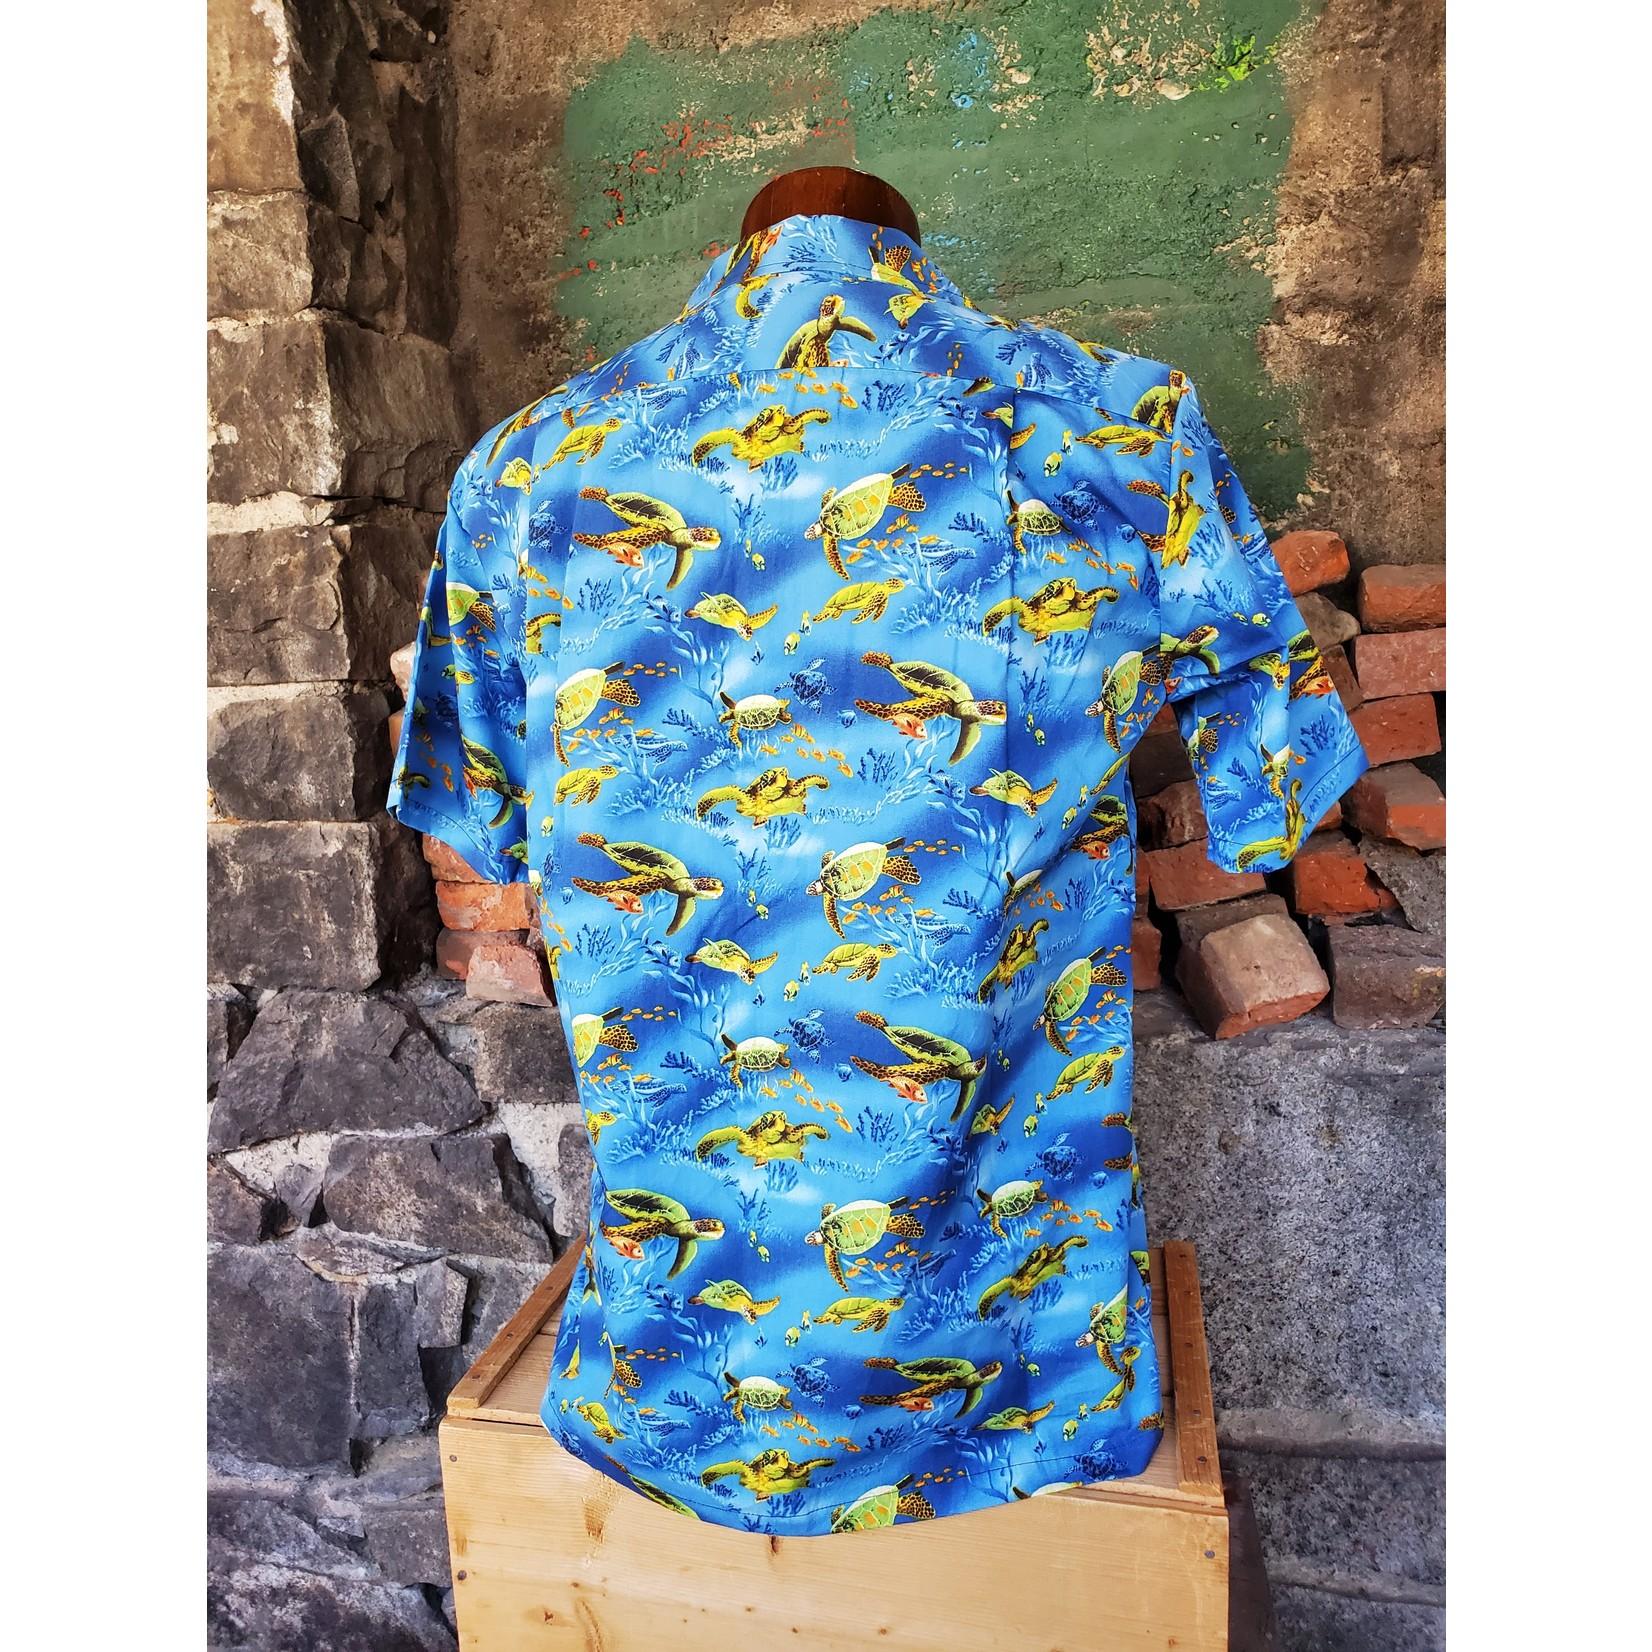 RJC Authentic Hawaiian Shirt - Turtles